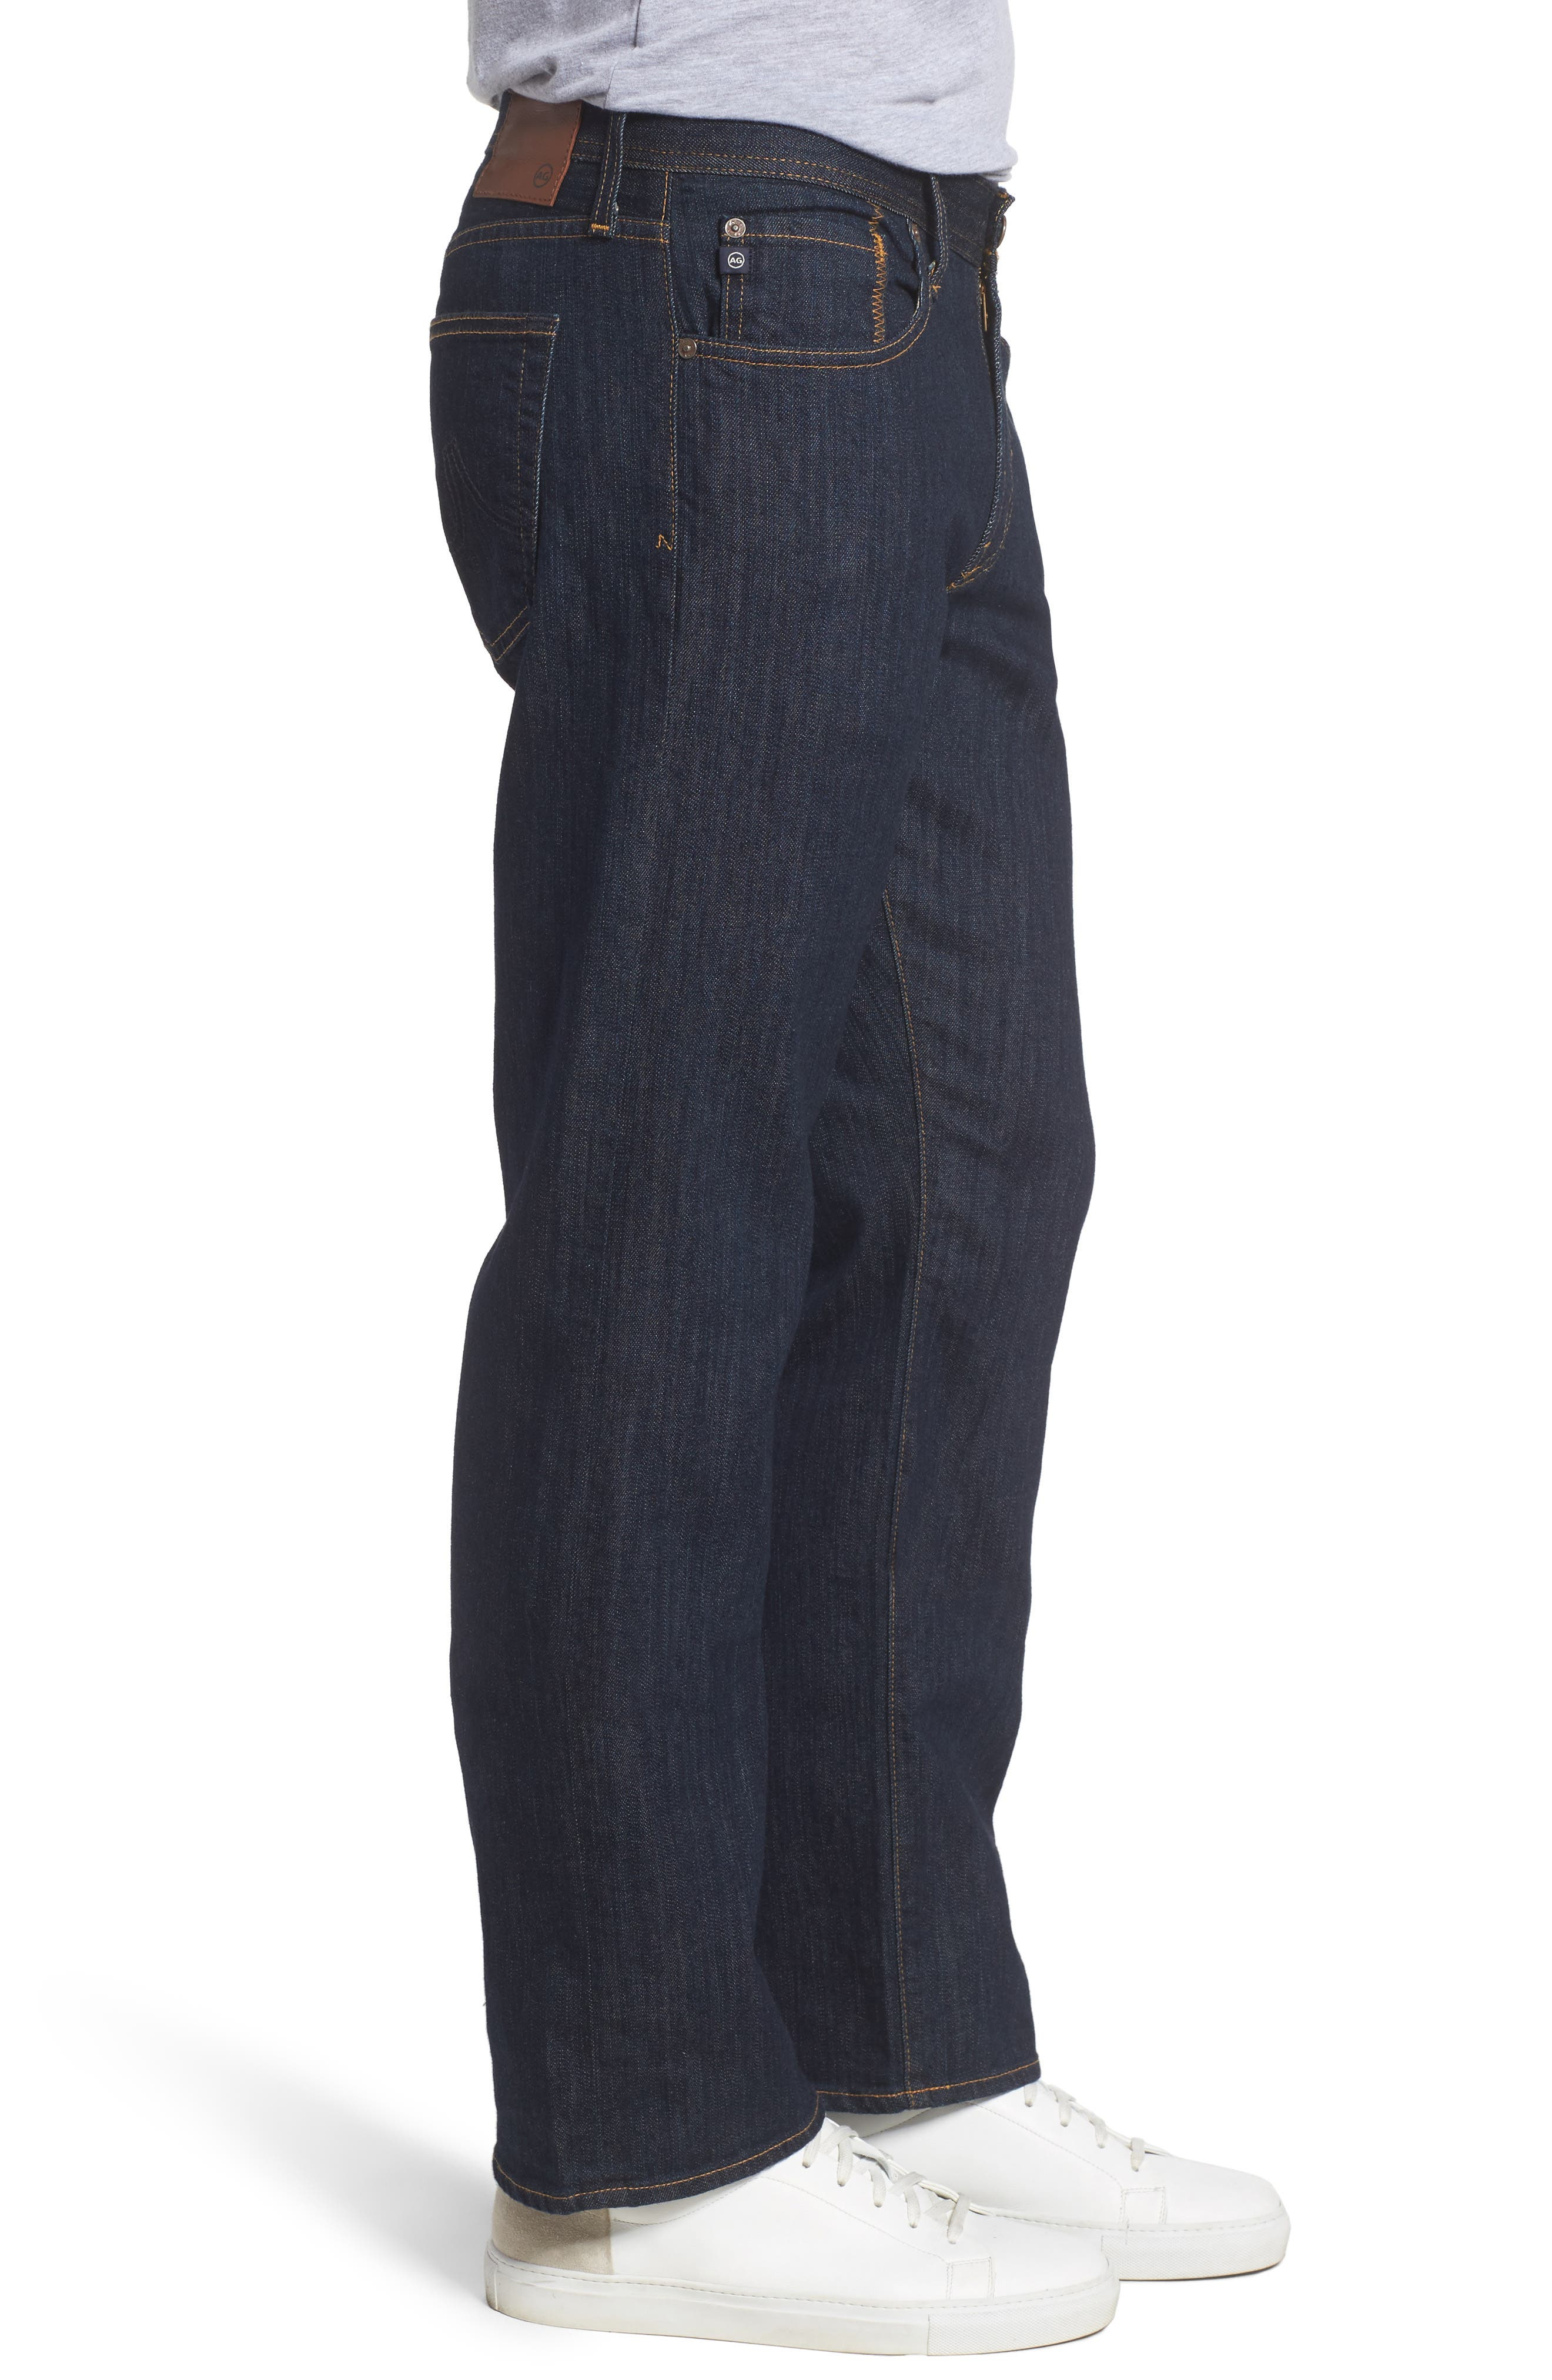 'Protégé' Straight Leg Jeans,                             Alternate thumbnail 3, color,                             Blake